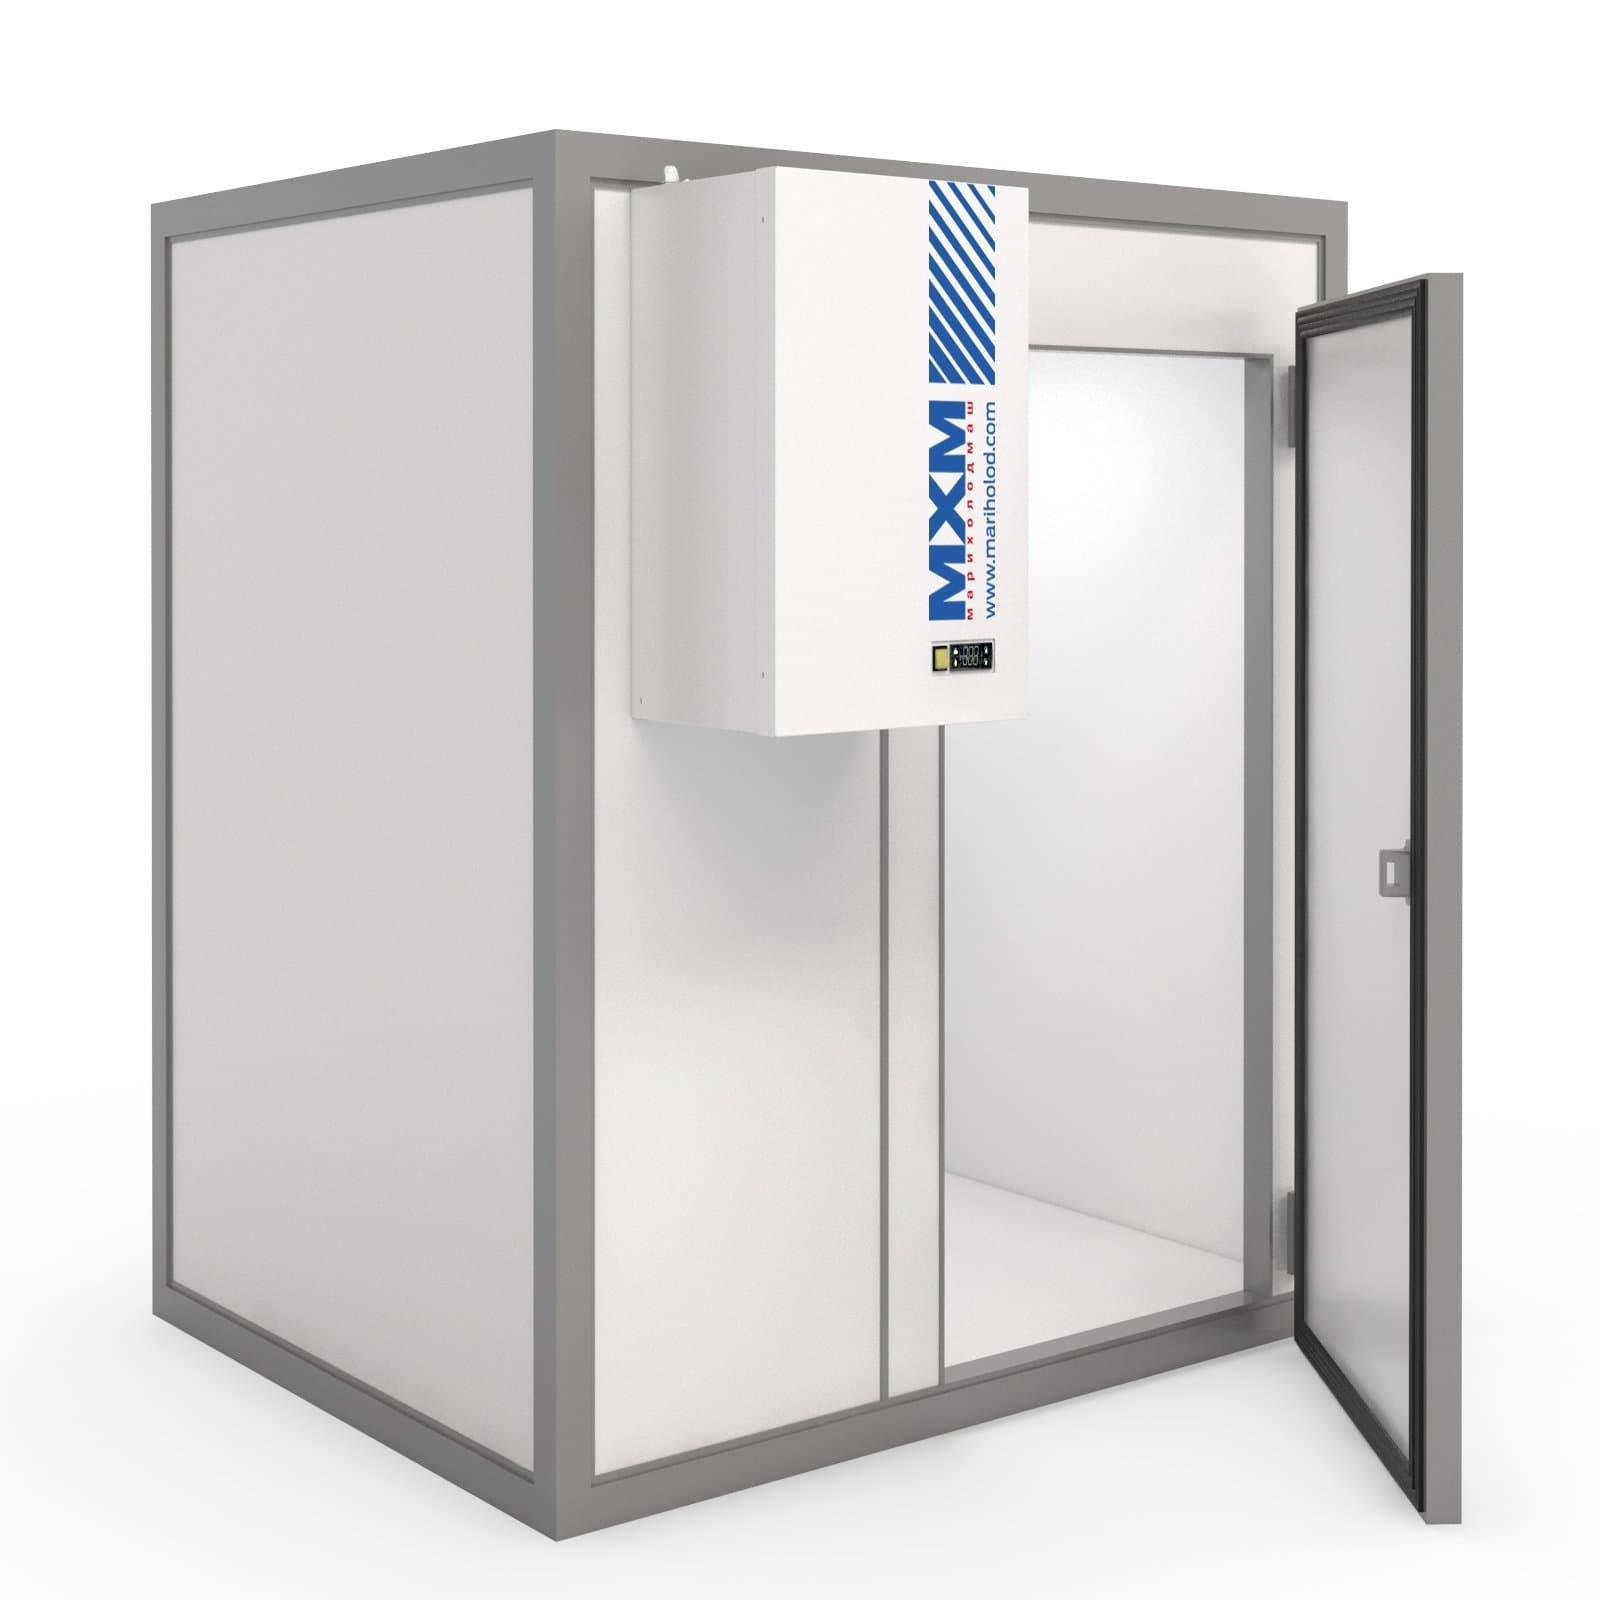 Камера холодильная МХМ КХН-4,59 1660×1660×2200